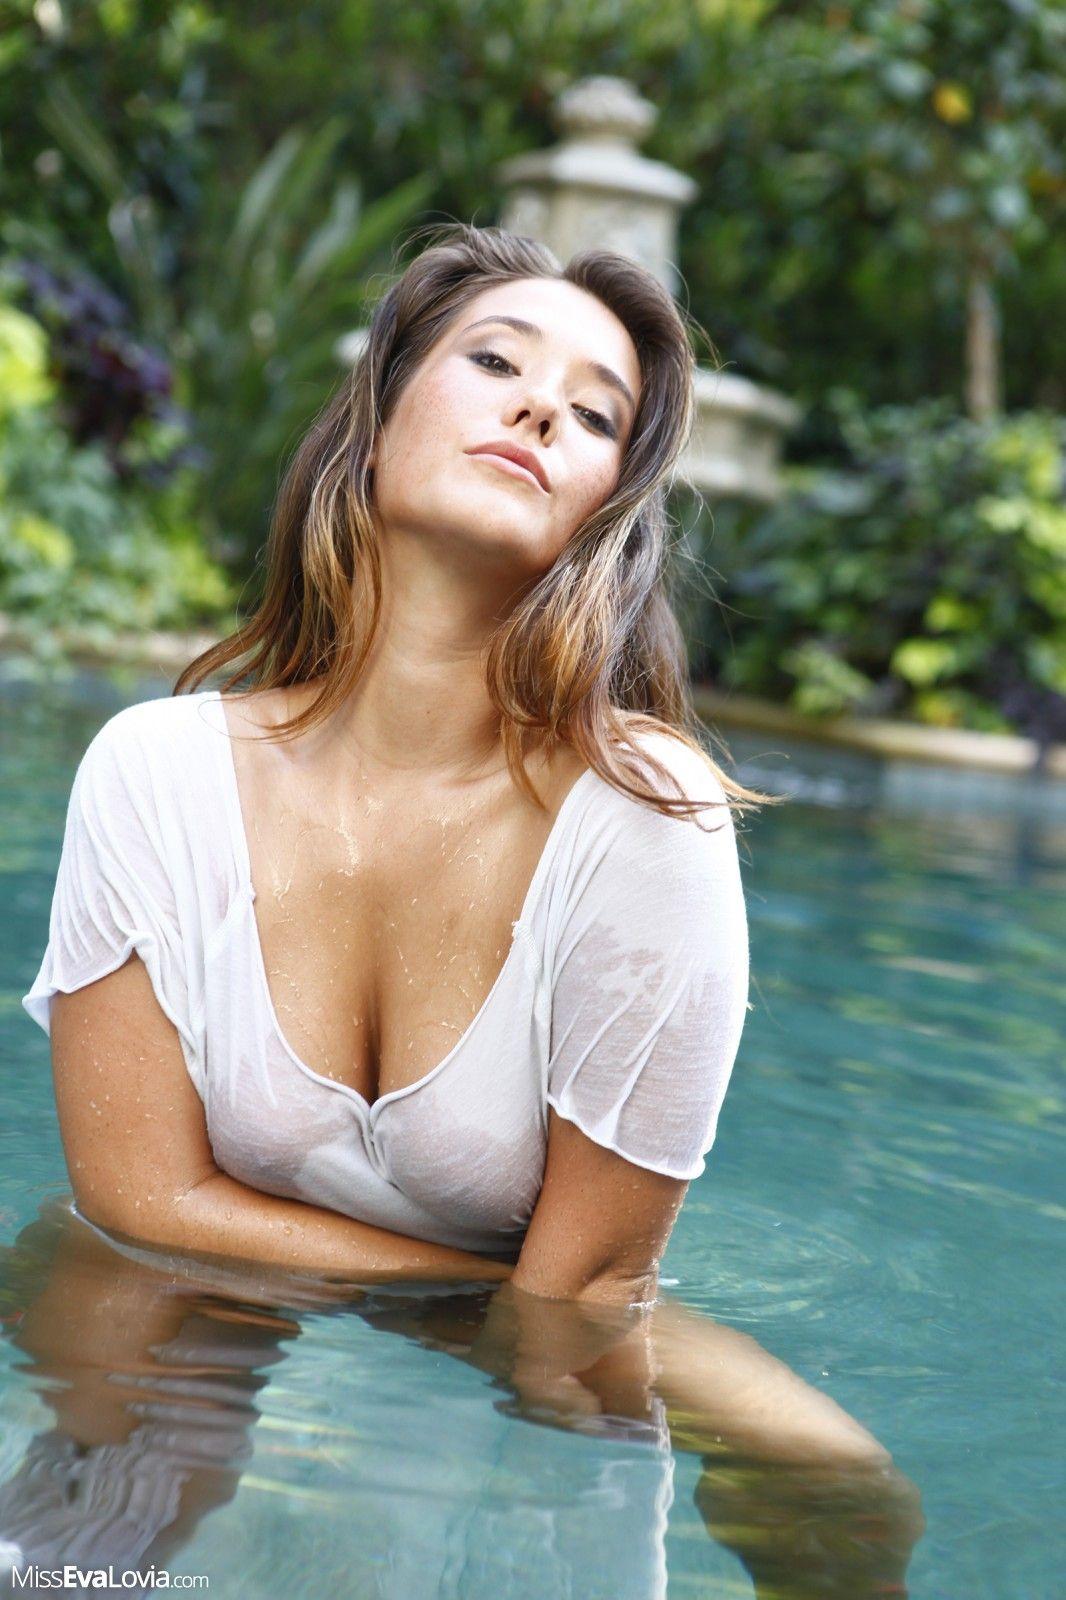 Eva Lovia Kk Pinterest Woman And Summer